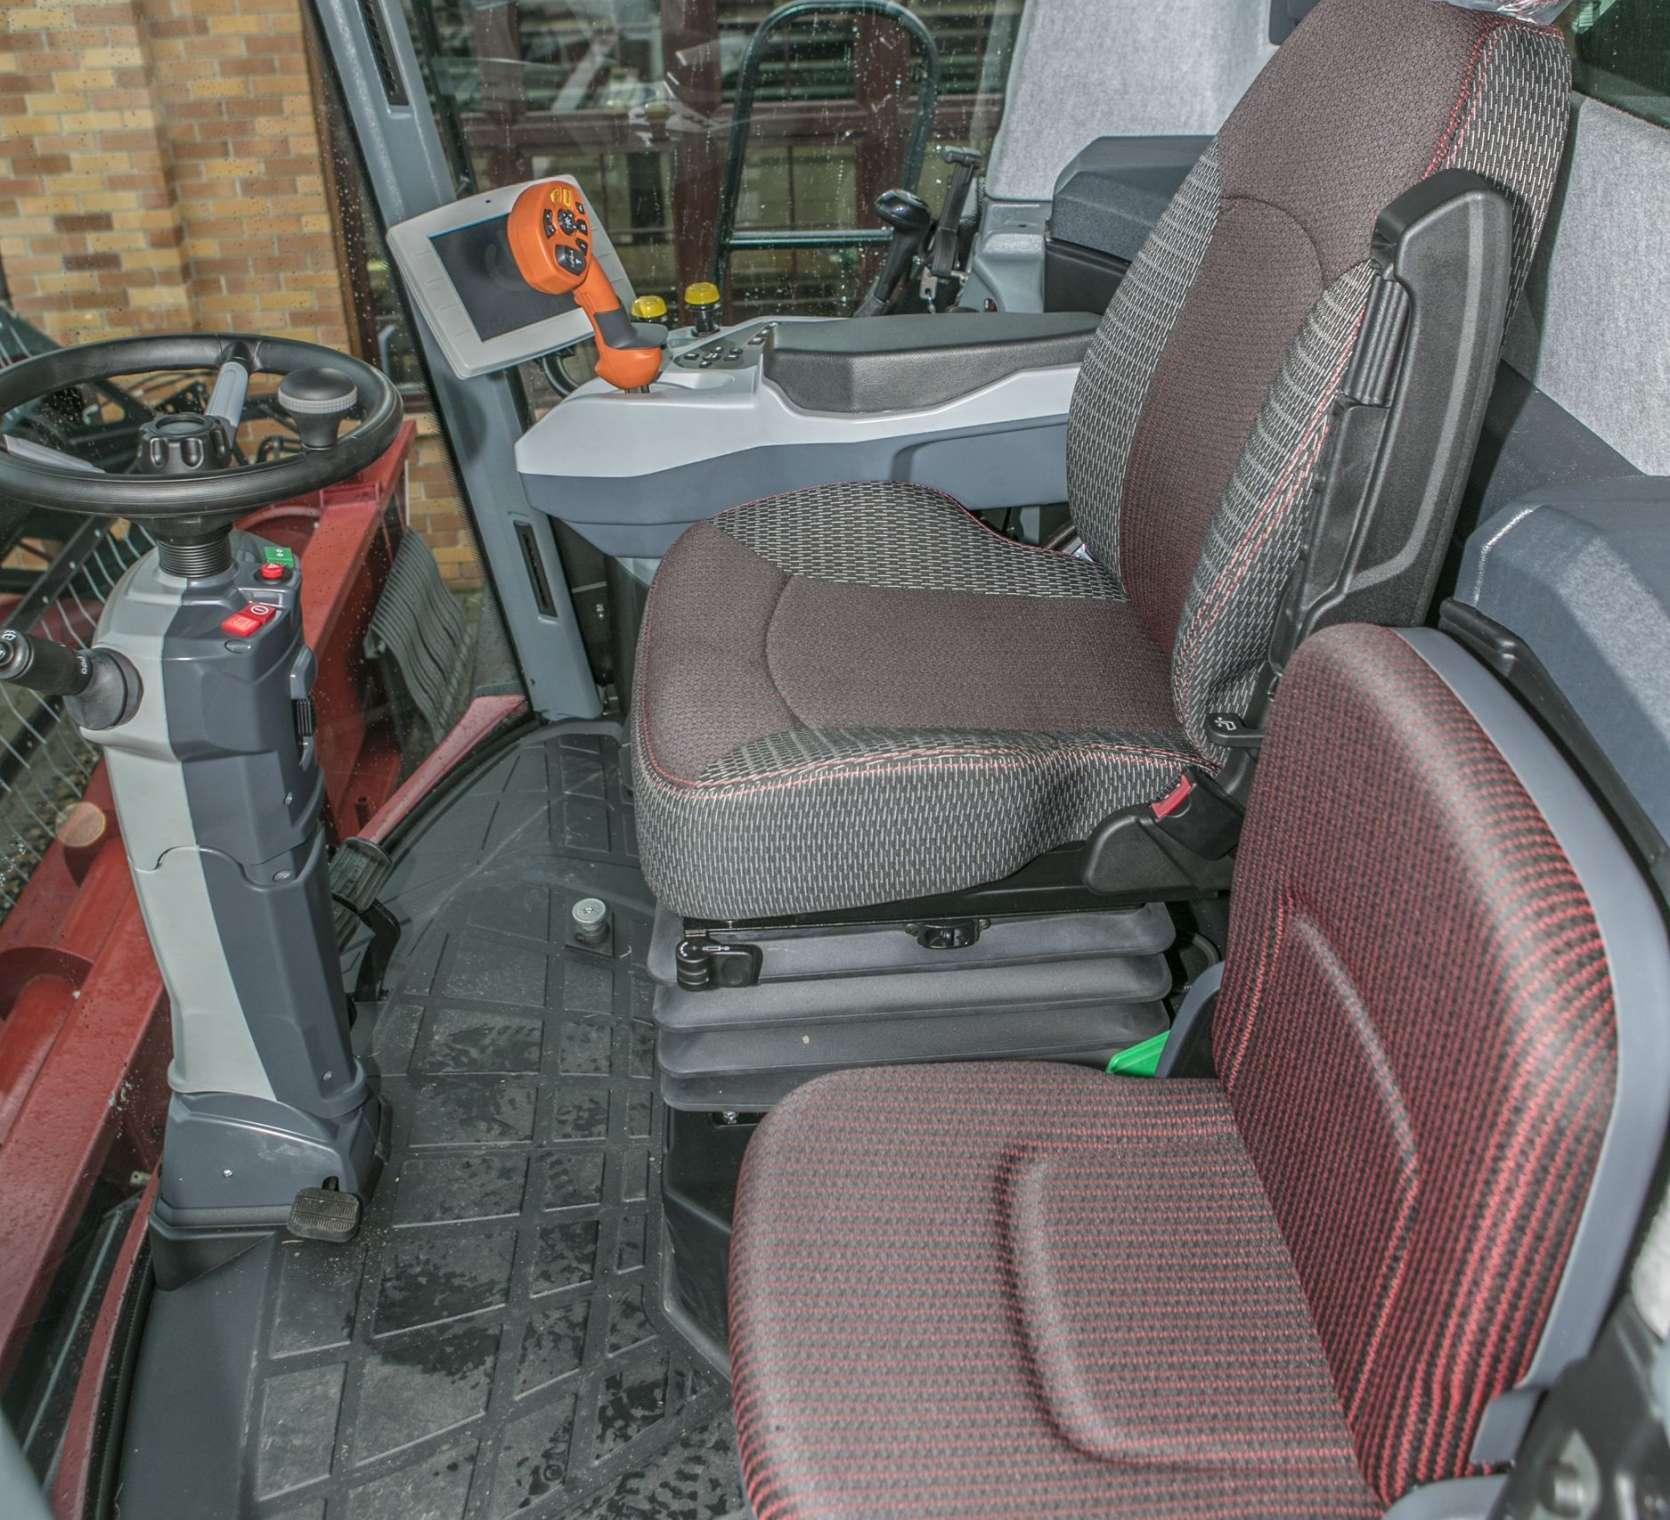 Kombajn zbożowy Rostselmash RSM 161 kabina Luxory Cab oferta korbanek.pl